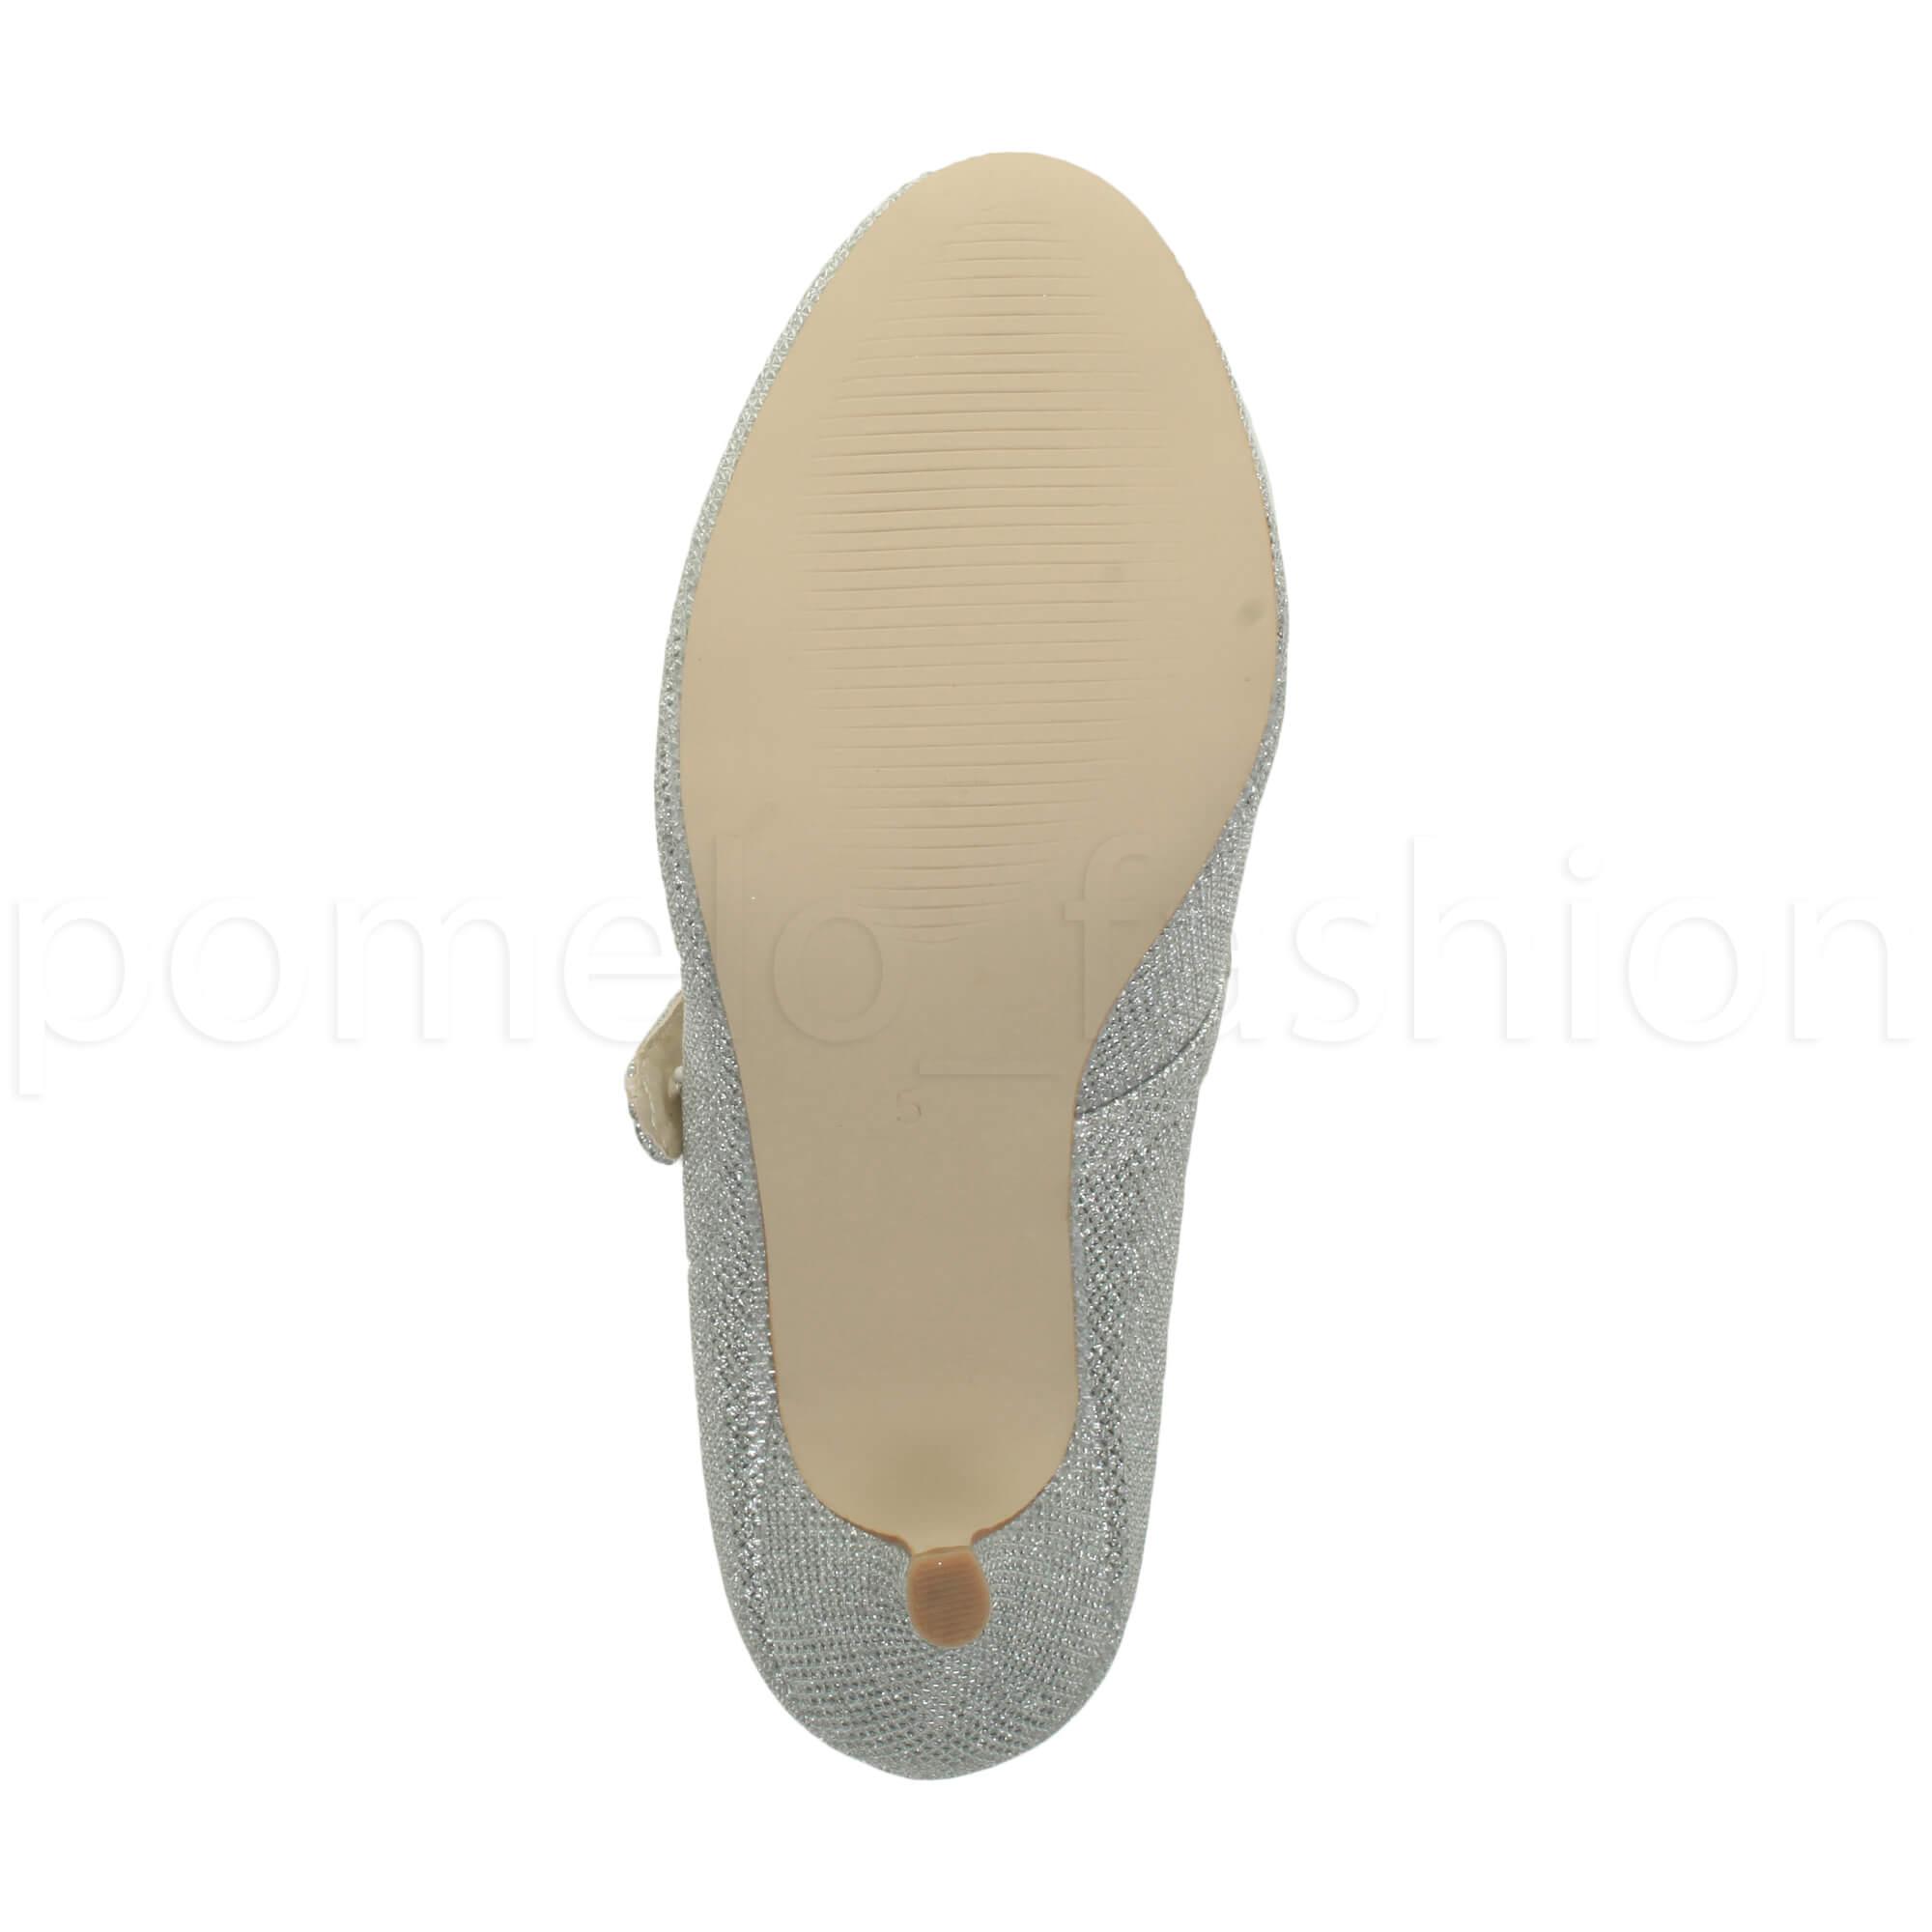 miniatura 169 - Donna basso tacco medio Mary Jane Damigella Matrimonio Pompe Scarpe Da Sera Taglia